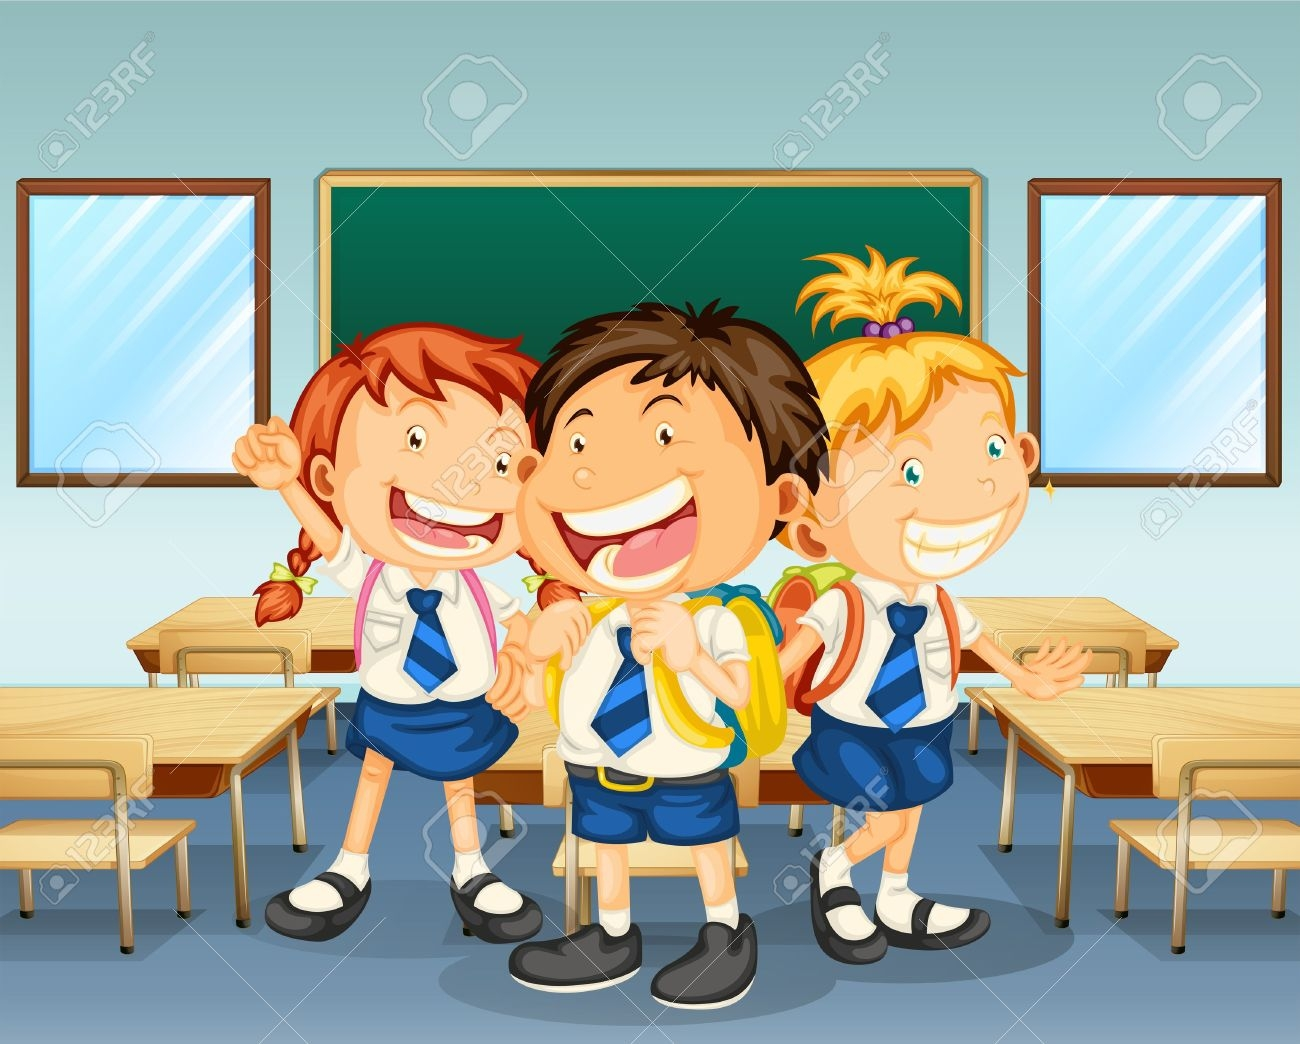 Children In Classroom Clipart.